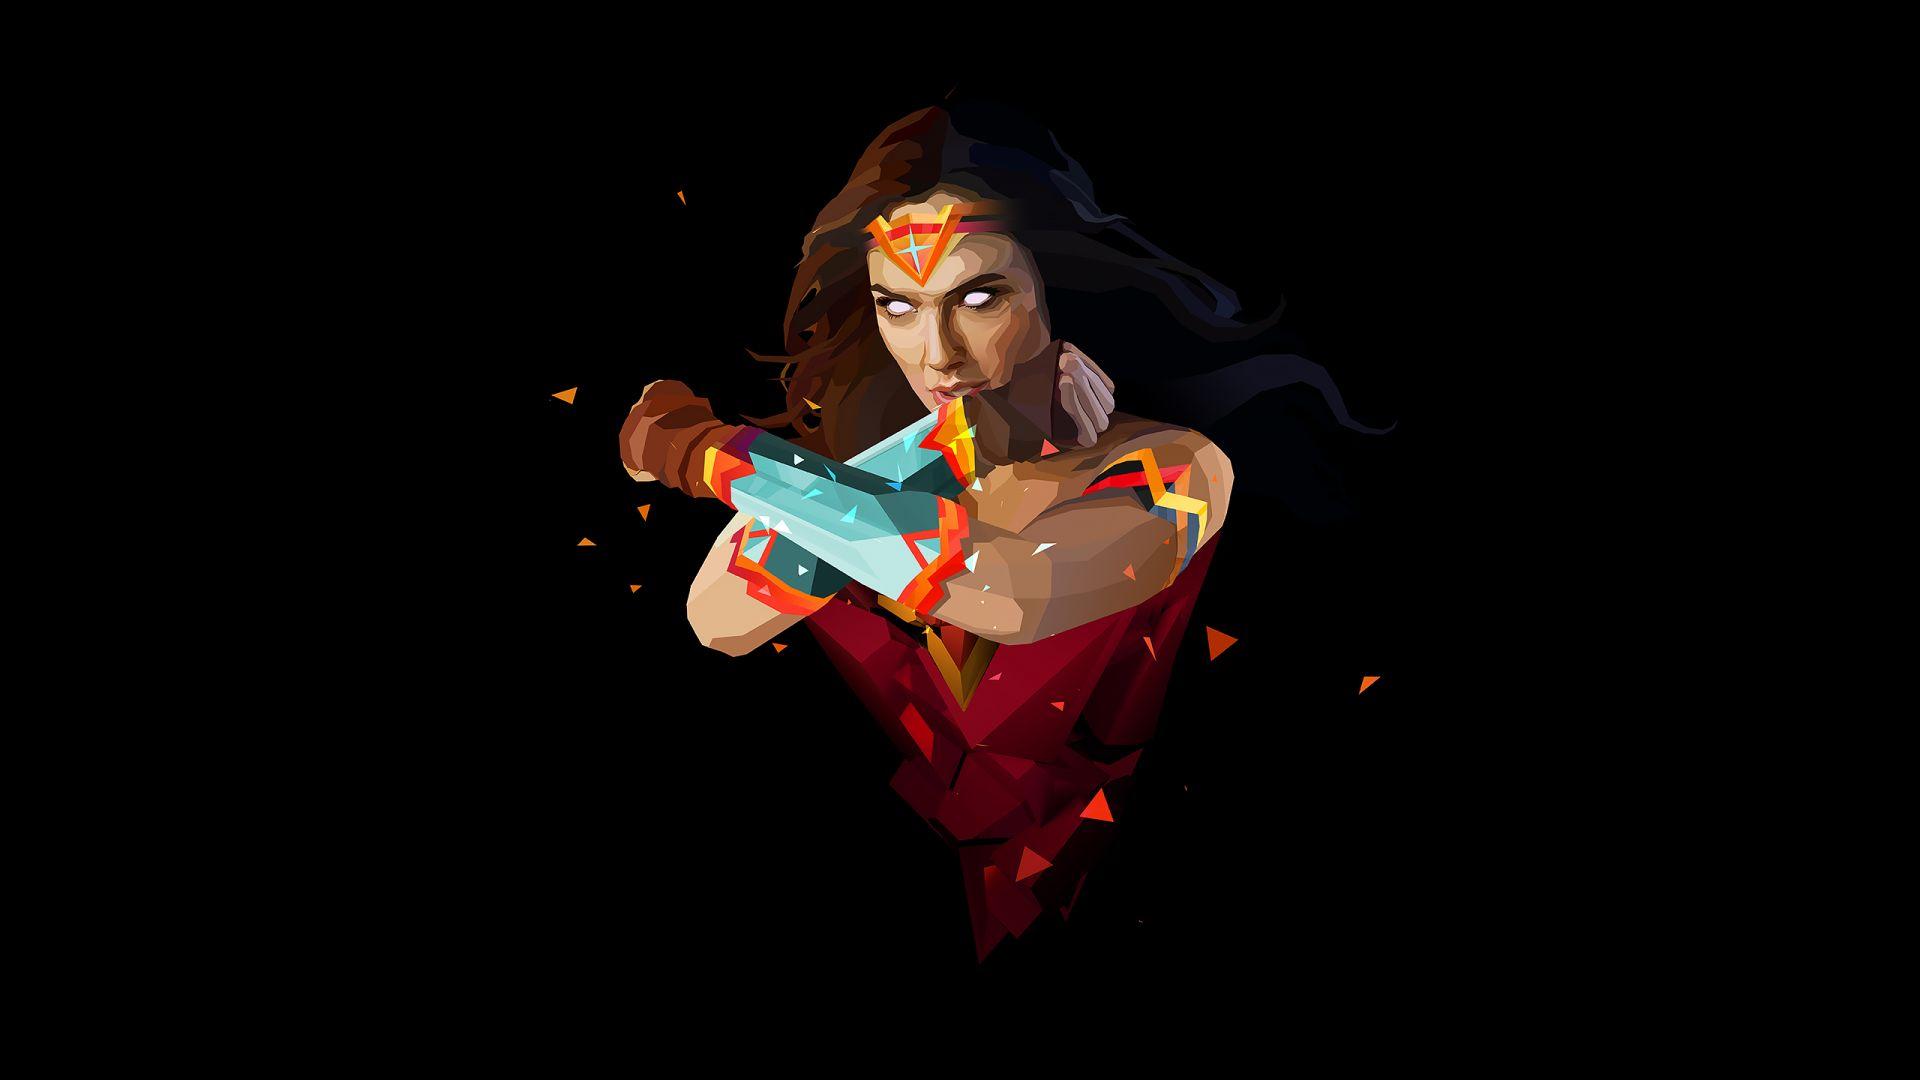 Wallpaper Wonder woman, digital artwork, superhero, abstract, art